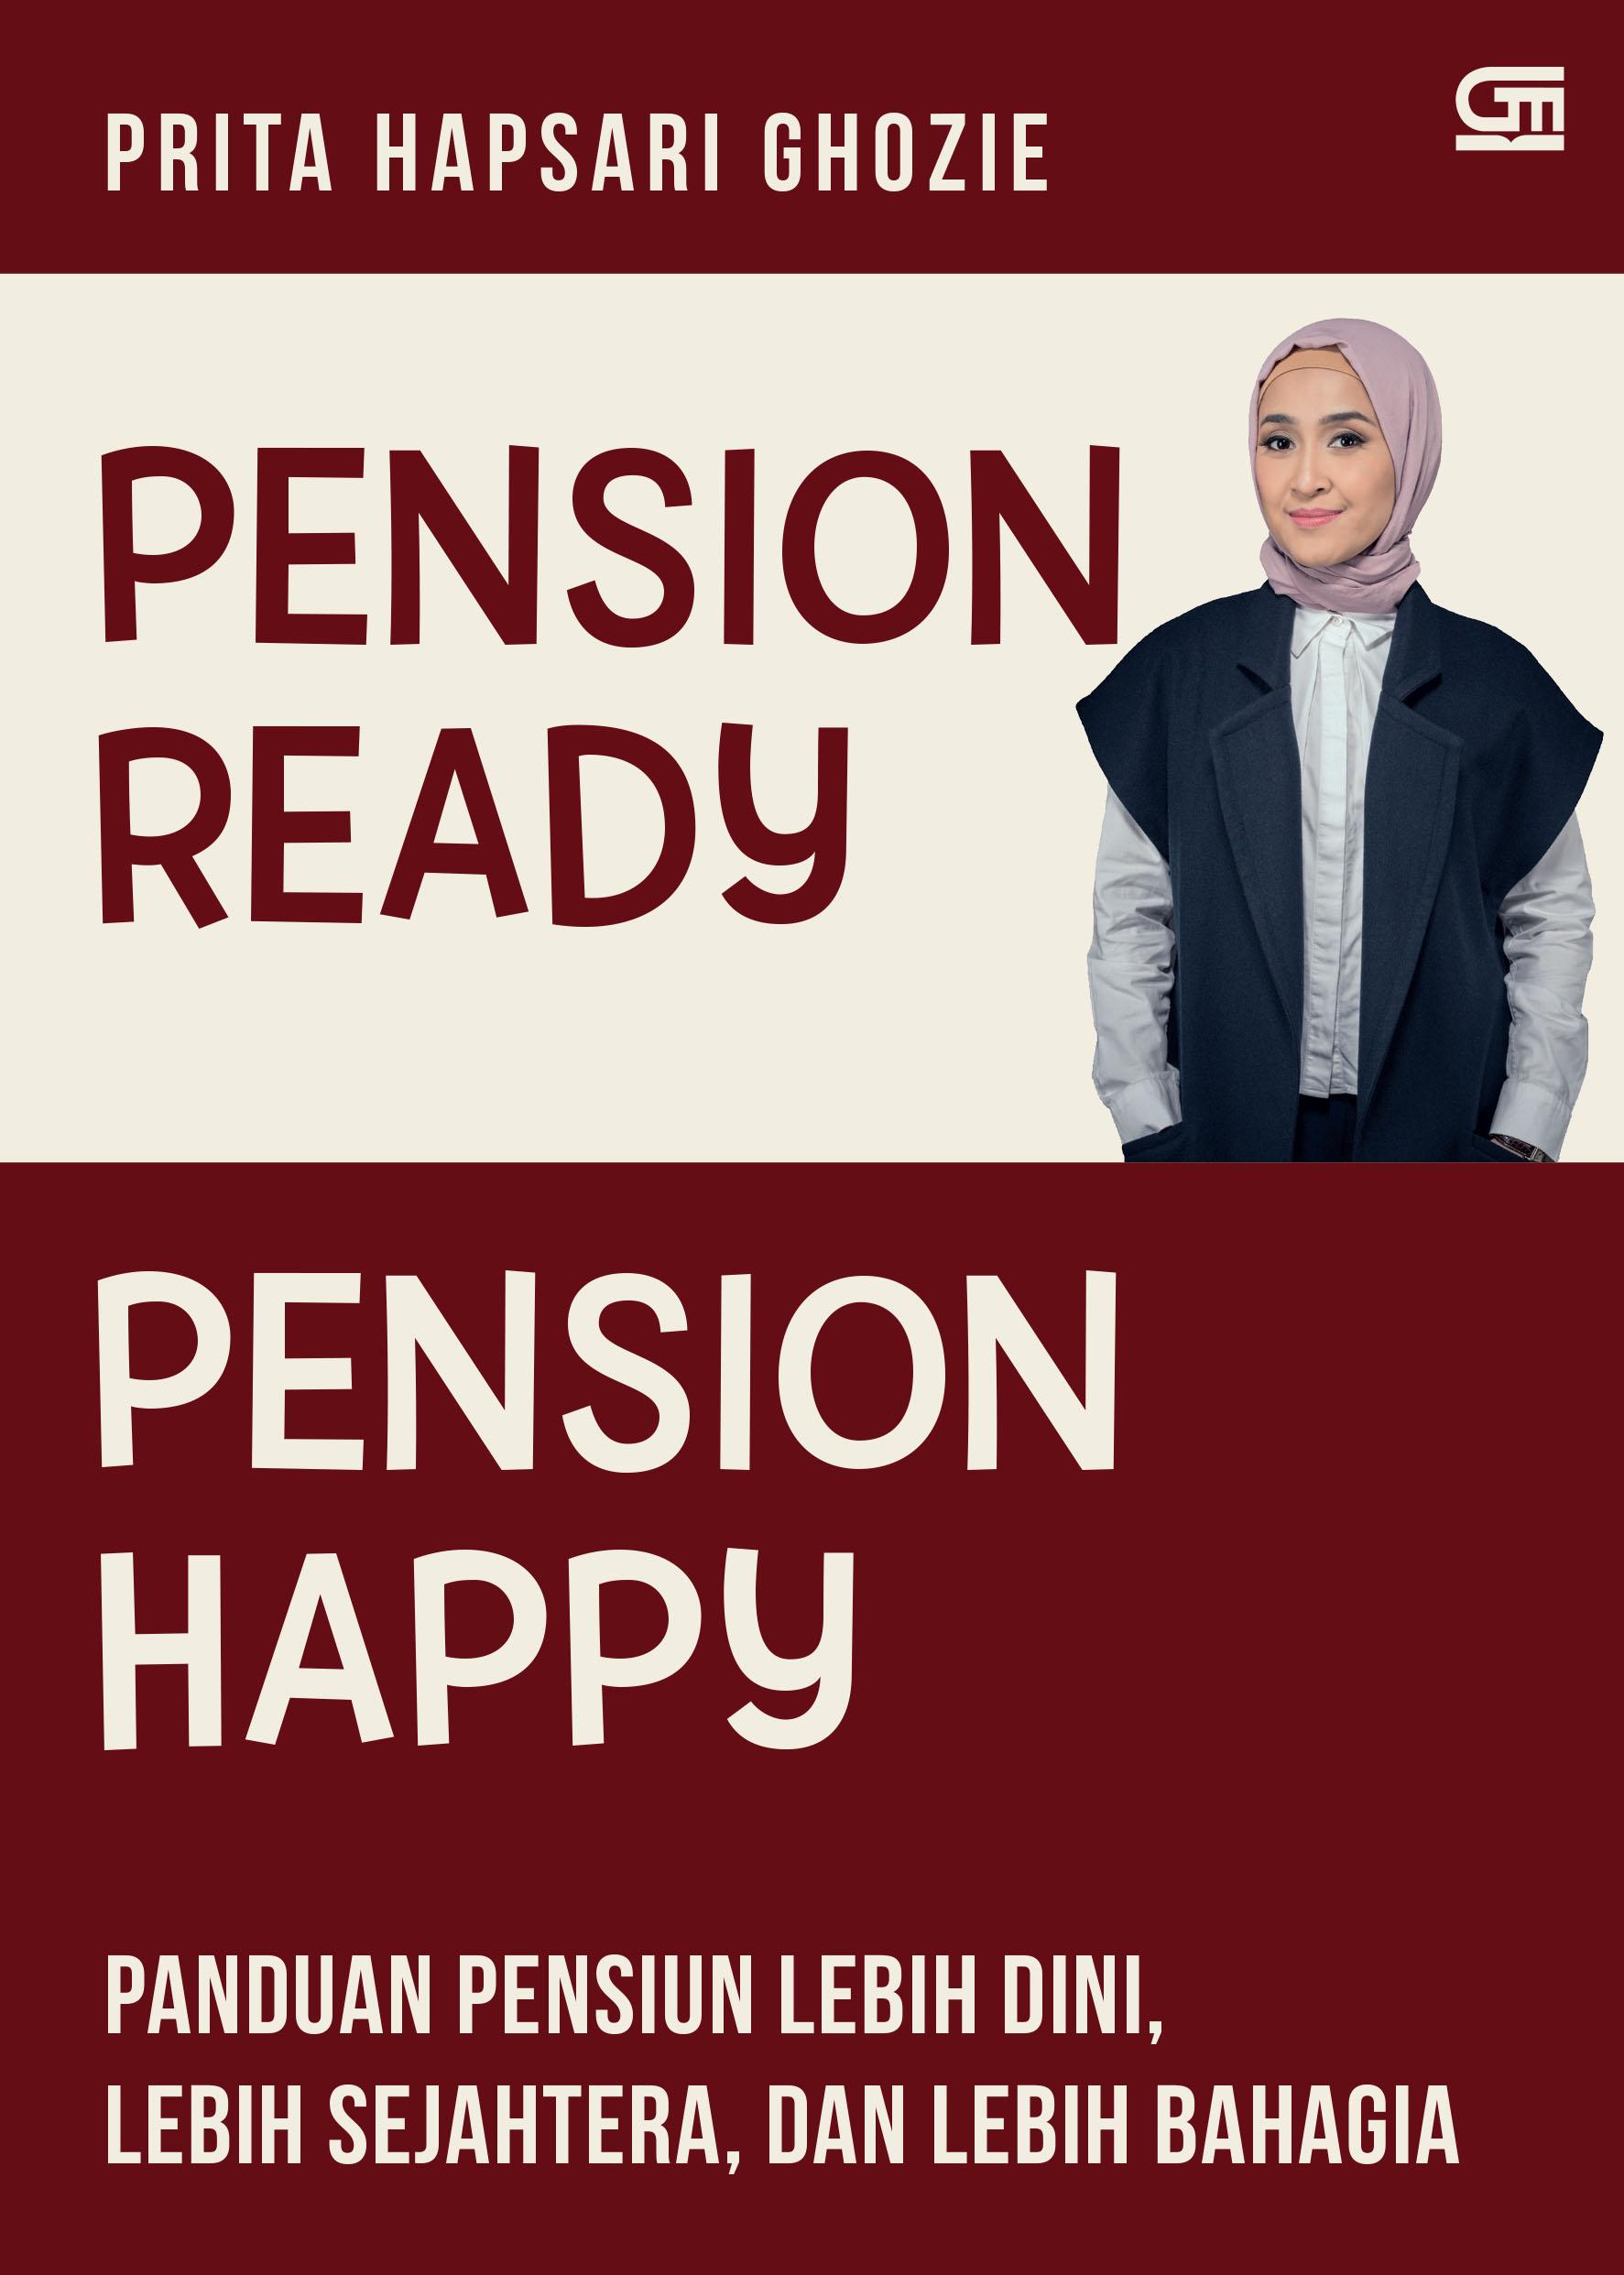 Pension Ready, Pension Happy